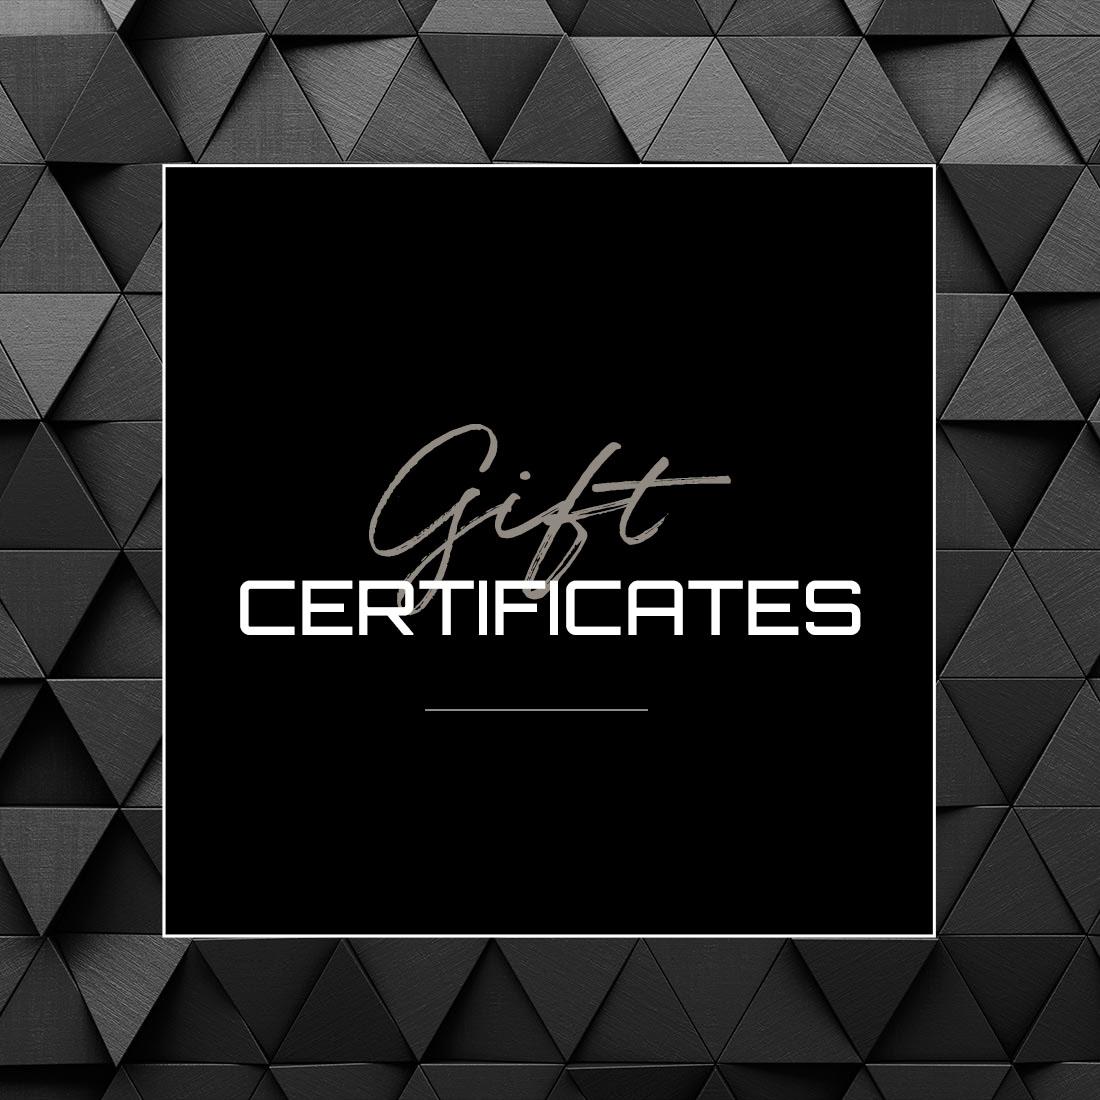 salon and spa gift certificates Norfolk Ne